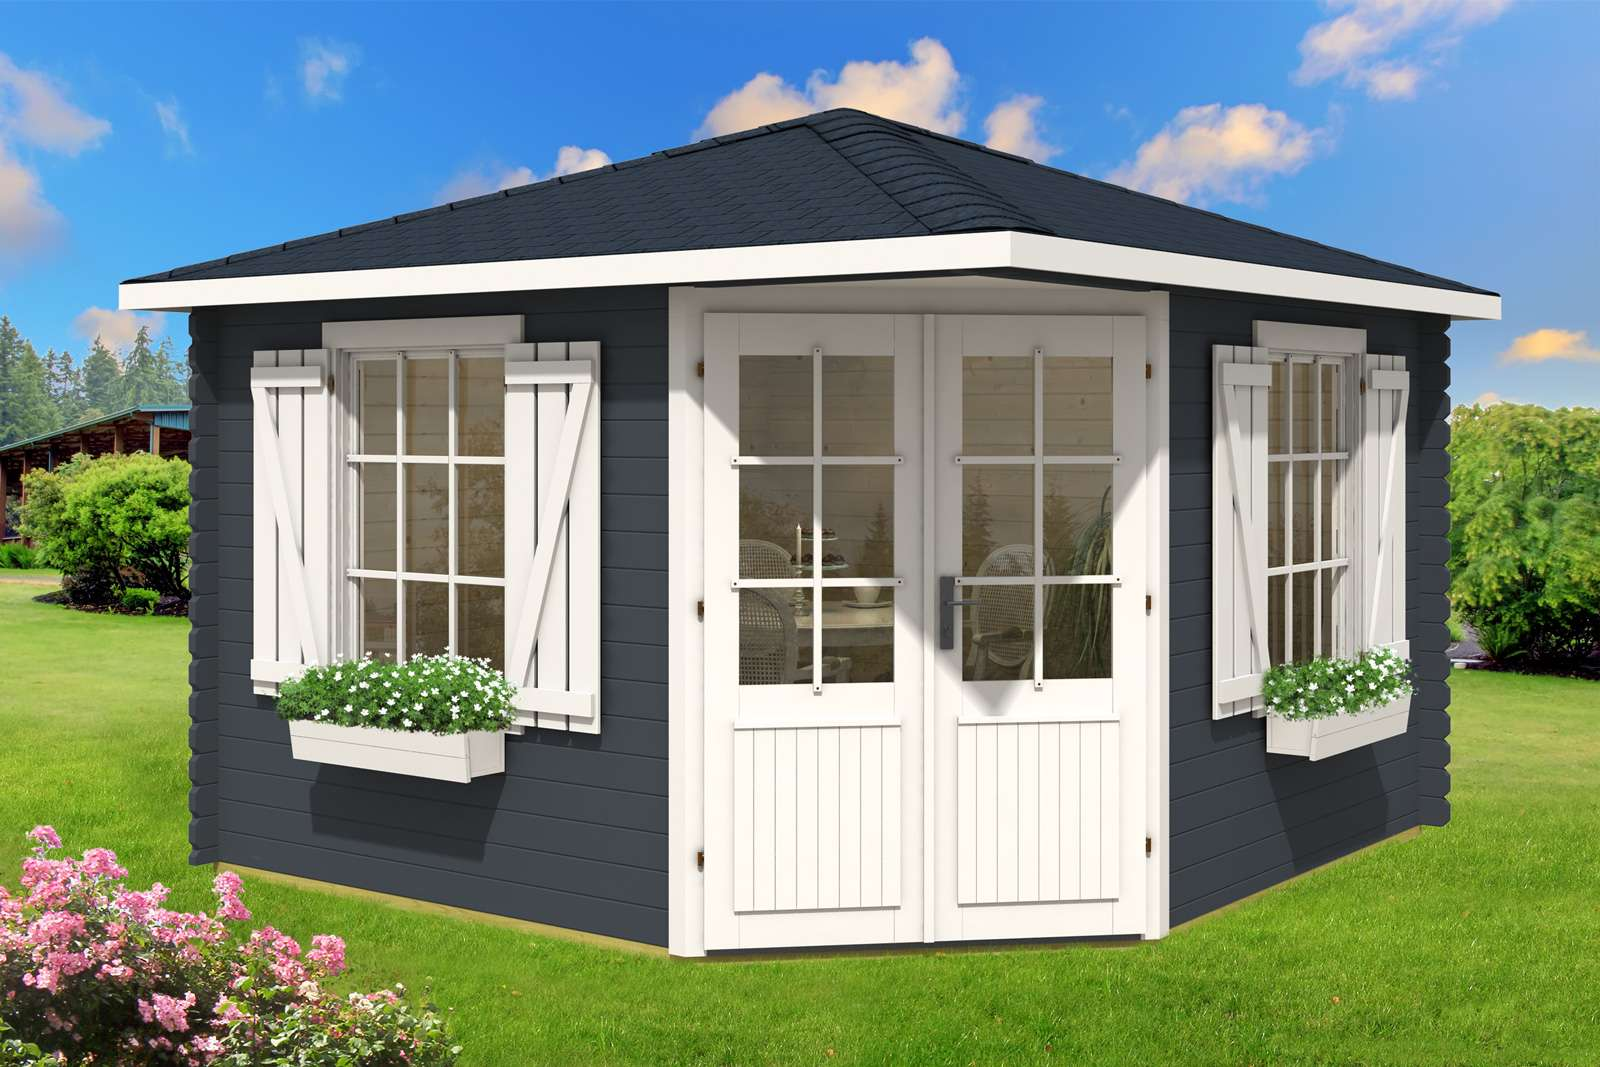 gartenhaus gmbh my blog. Black Bedroom Furniture Sets. Home Design Ideas